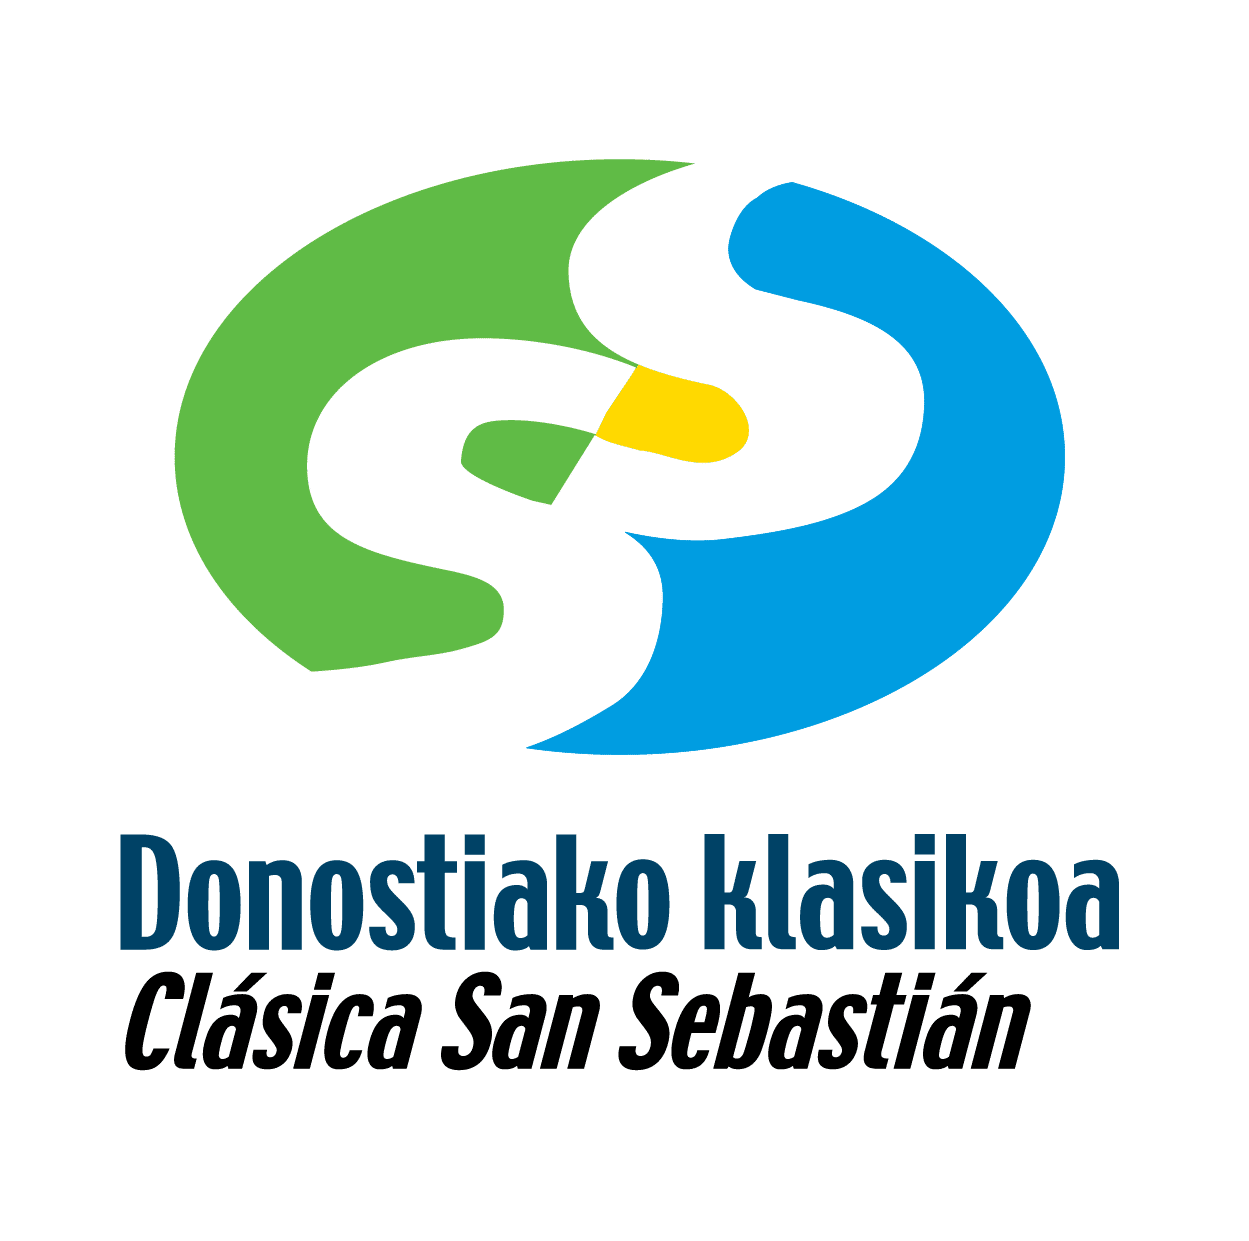 clásica san sebastian